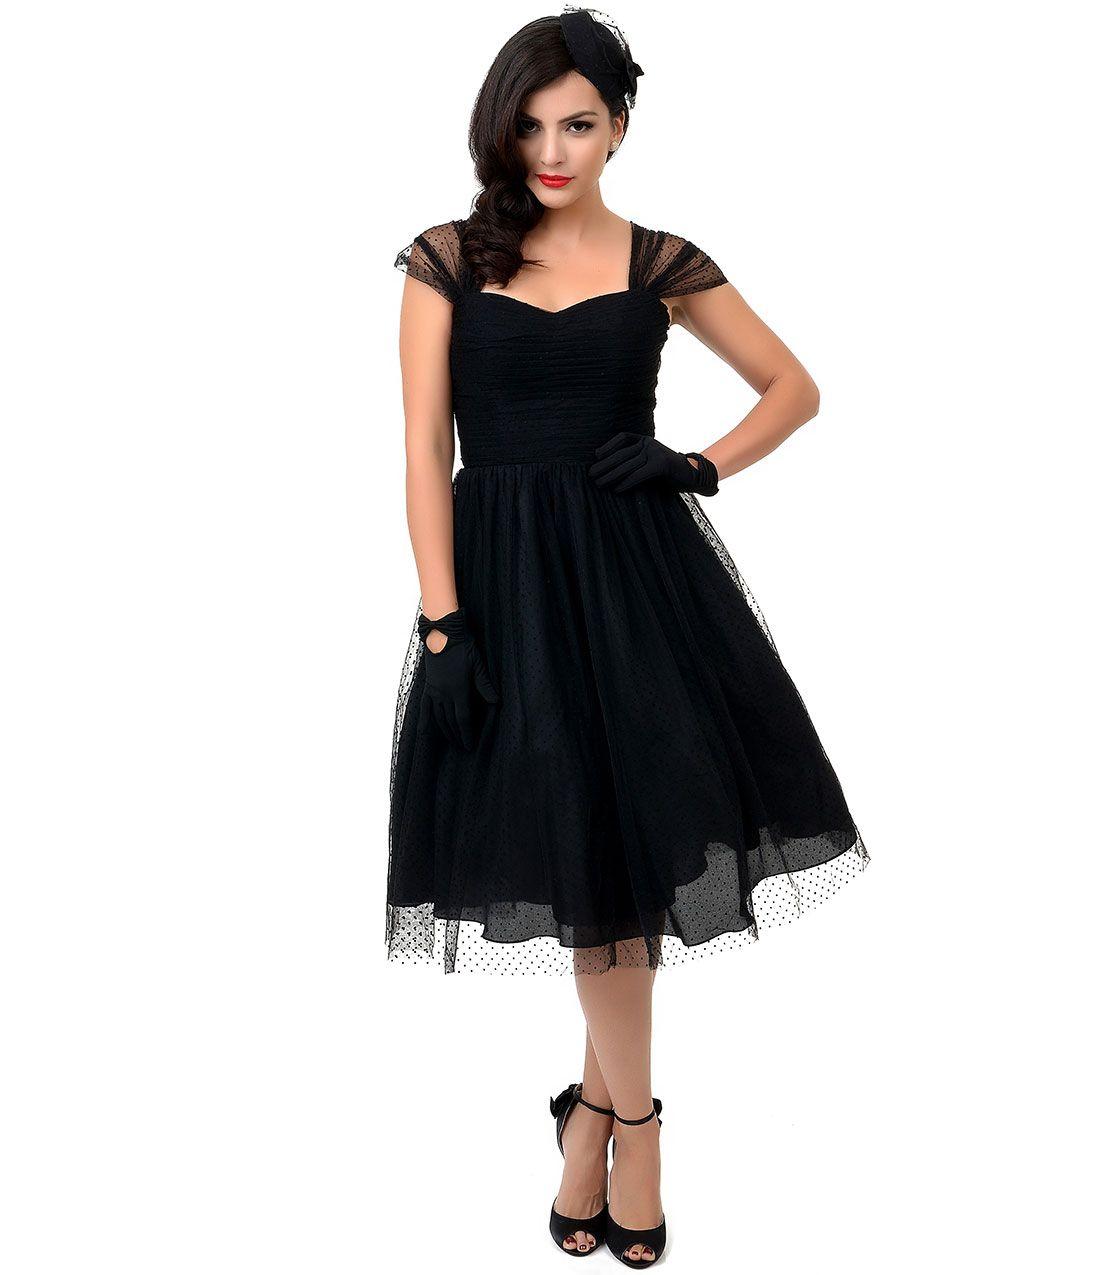 50 Vintage Halloween Costume Ideas Mesh Cocktail Dress Cheap Prom Dresses Online 1950s Fashion Dresses [ 1275 x 1095 Pixel ]